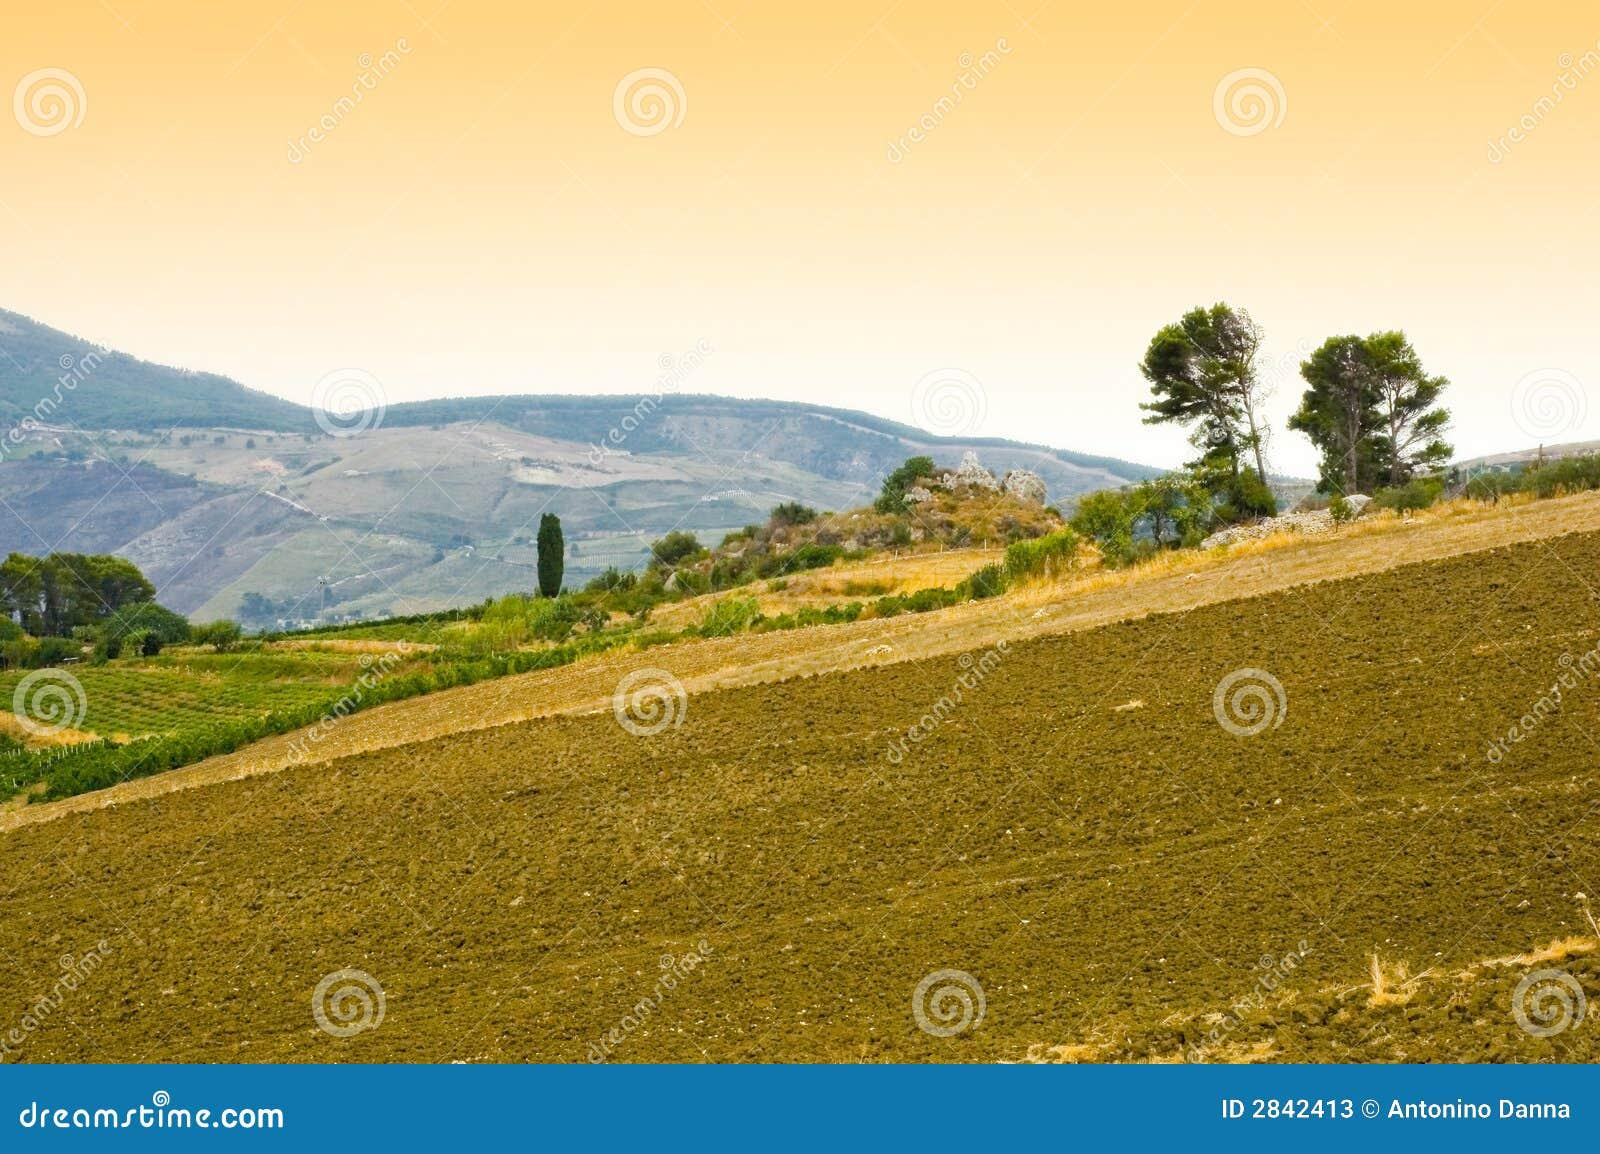 Field in sicily